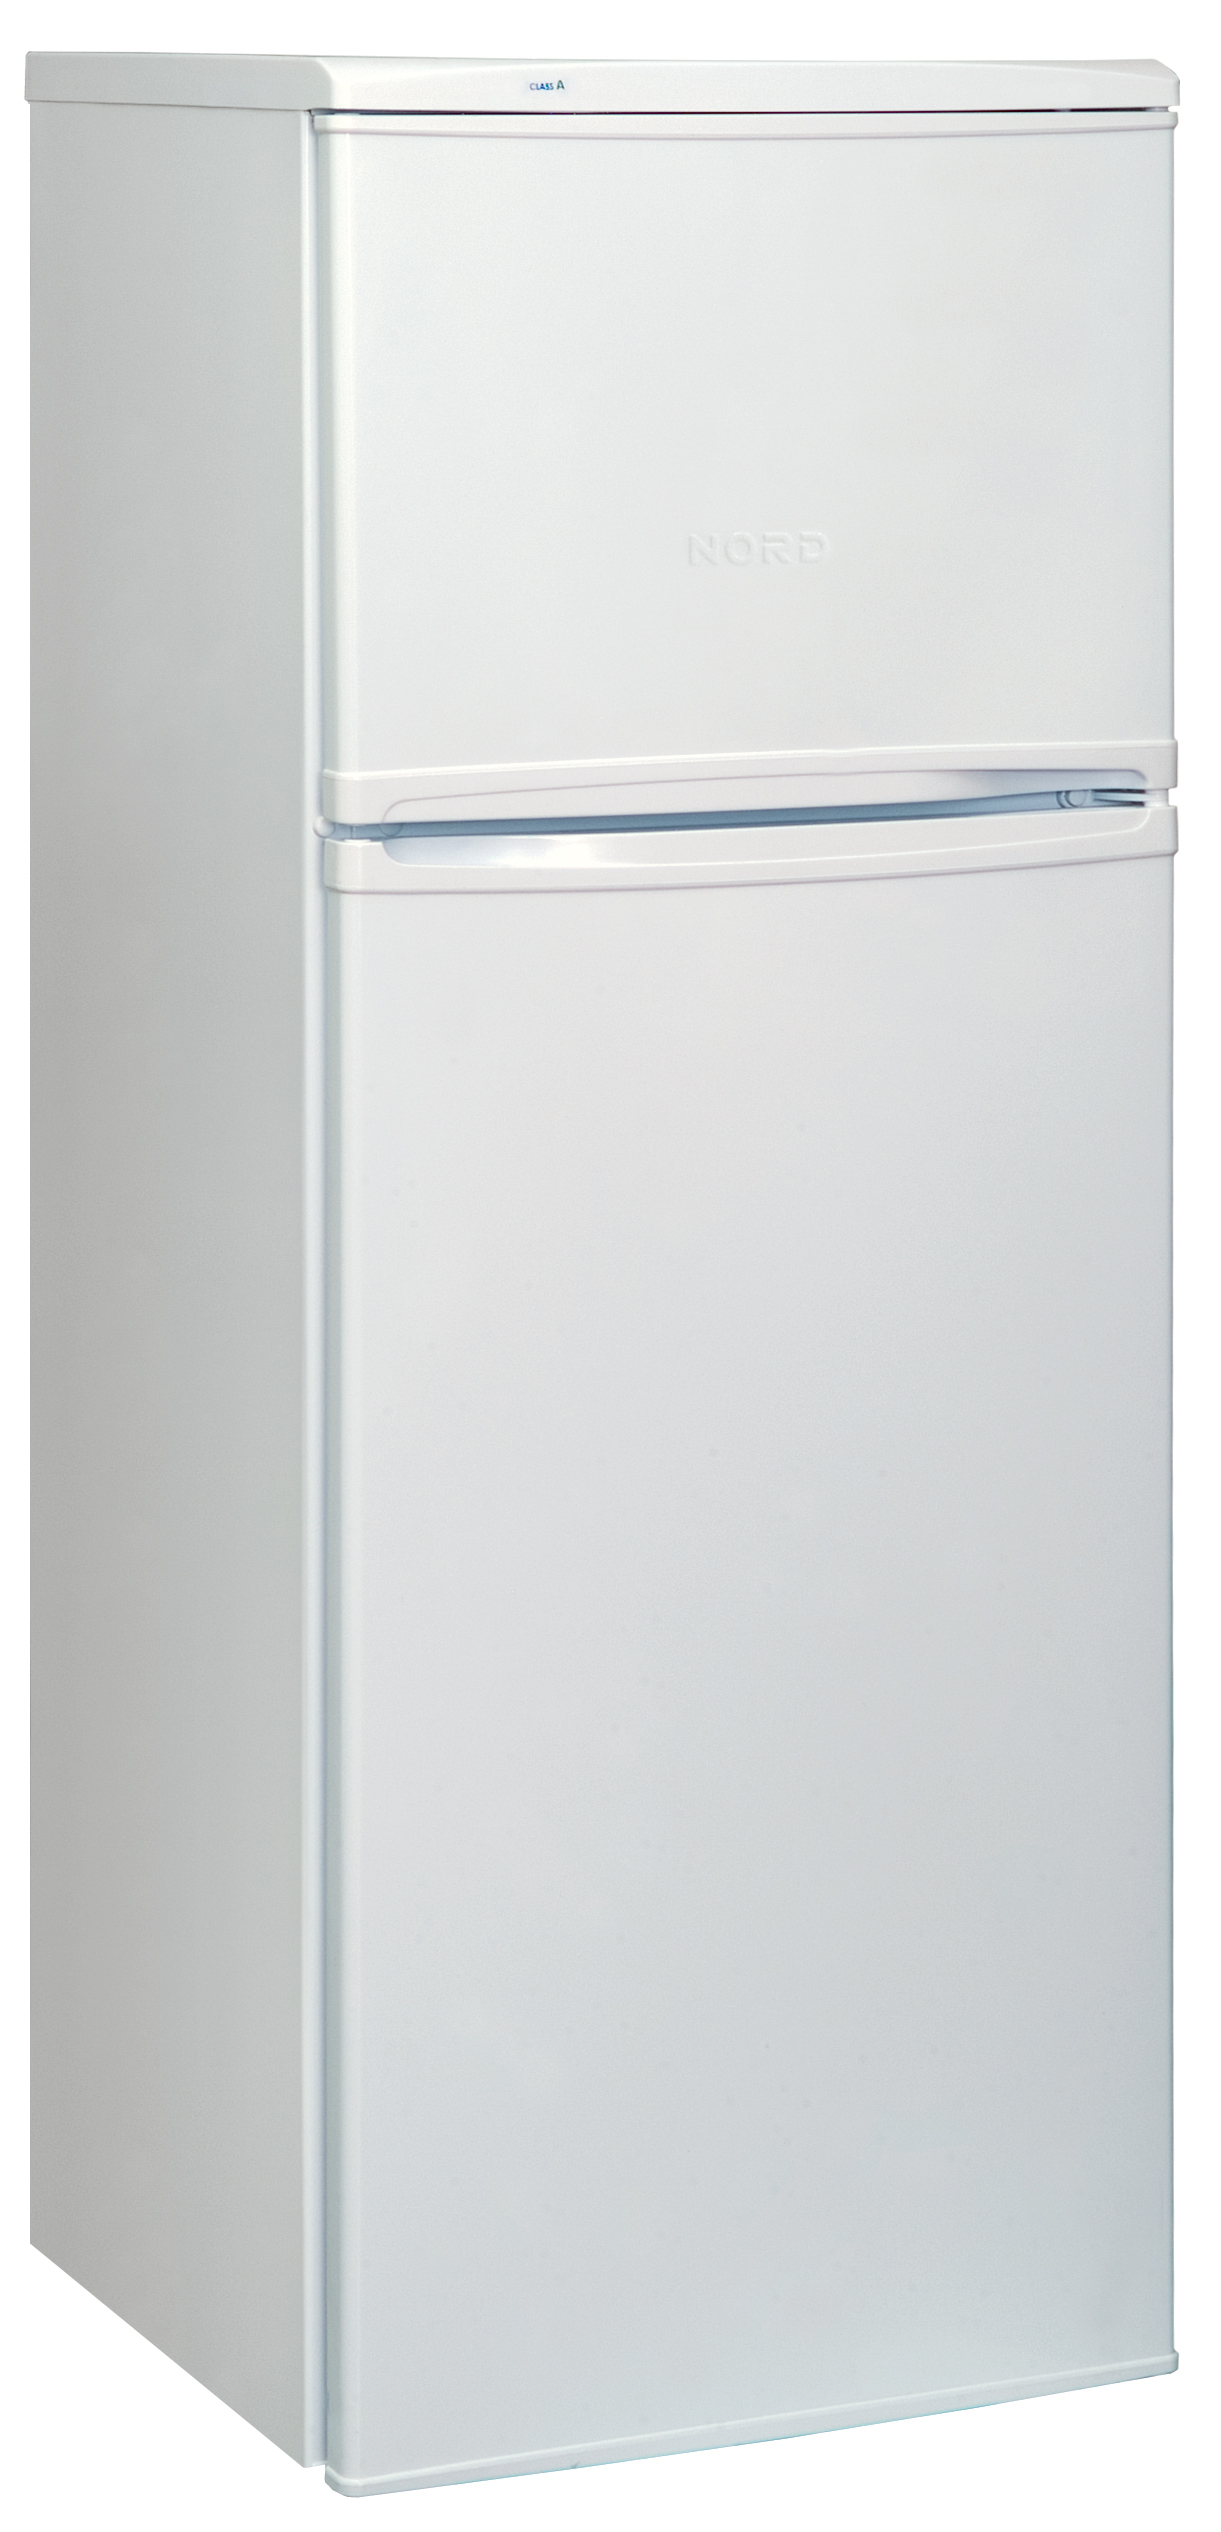 Холодильник Норд Real Brand Technics 11490.000